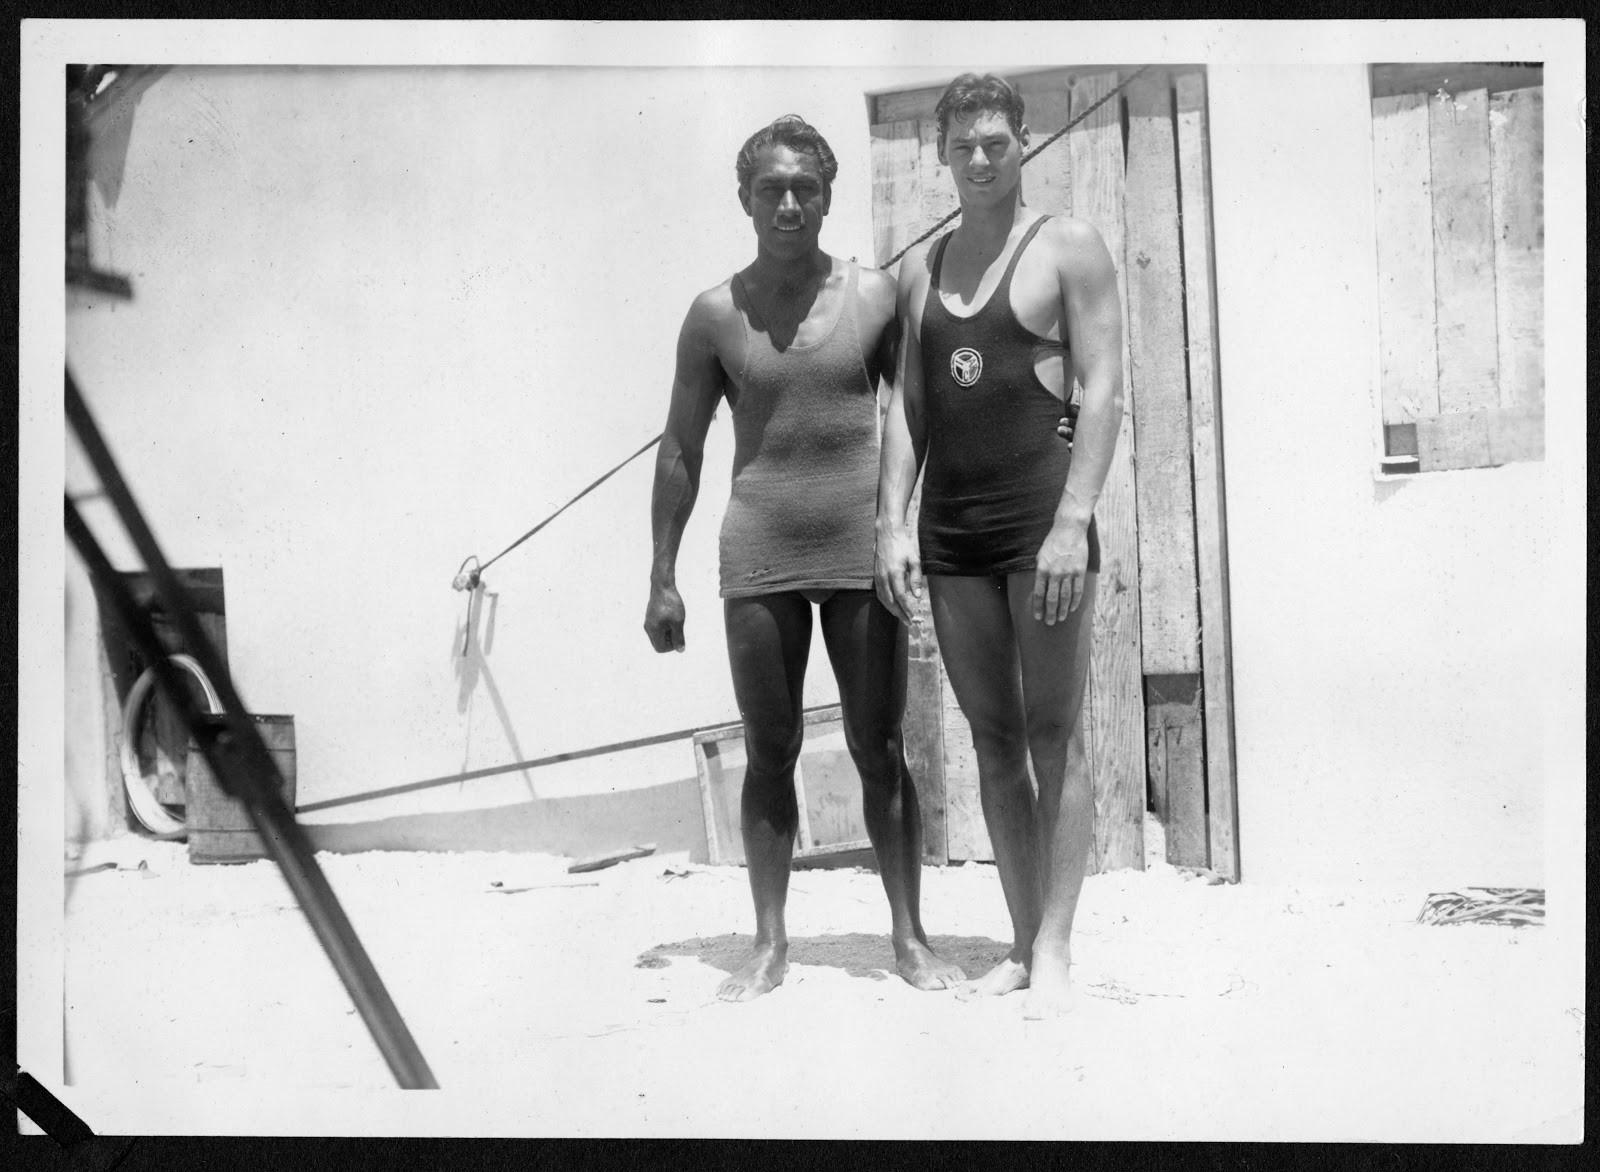 Image of Duke Kahanamoku and Johnny Weissmuller.